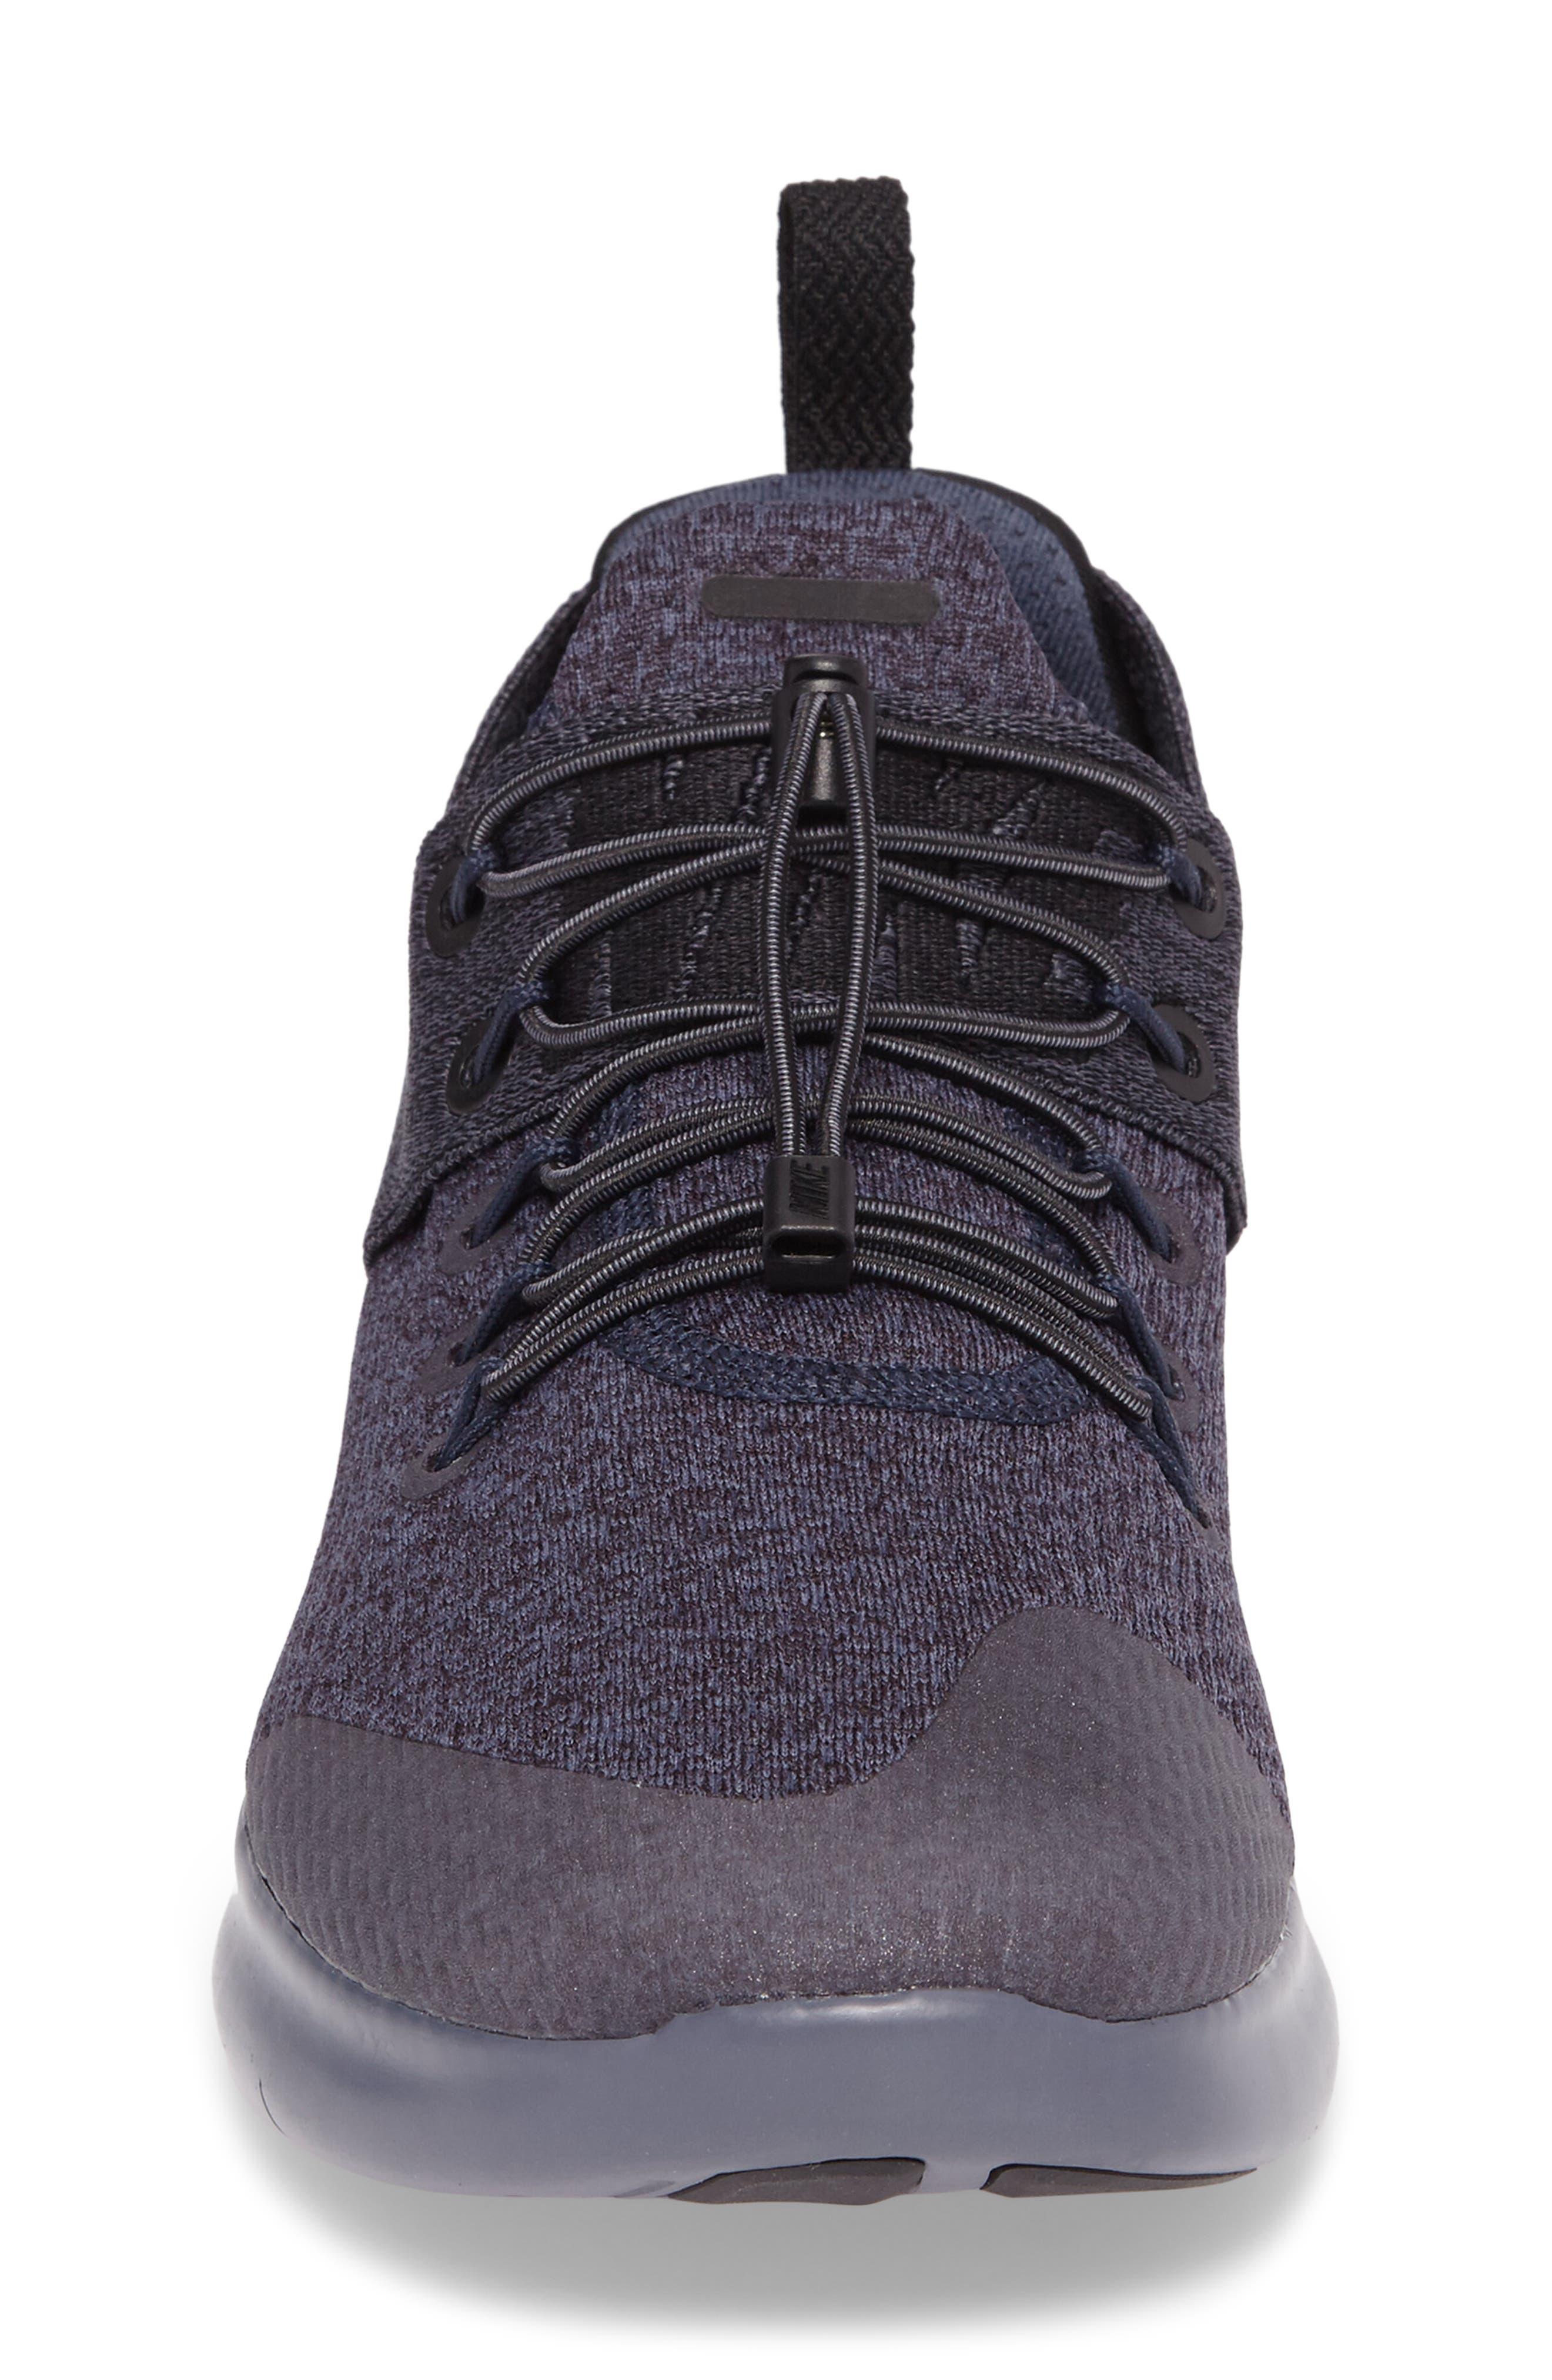 Free RN Commuter 2017 Premium Running Shoe,                             Alternate thumbnail 4, color,                             Light Carbon/Port Wine